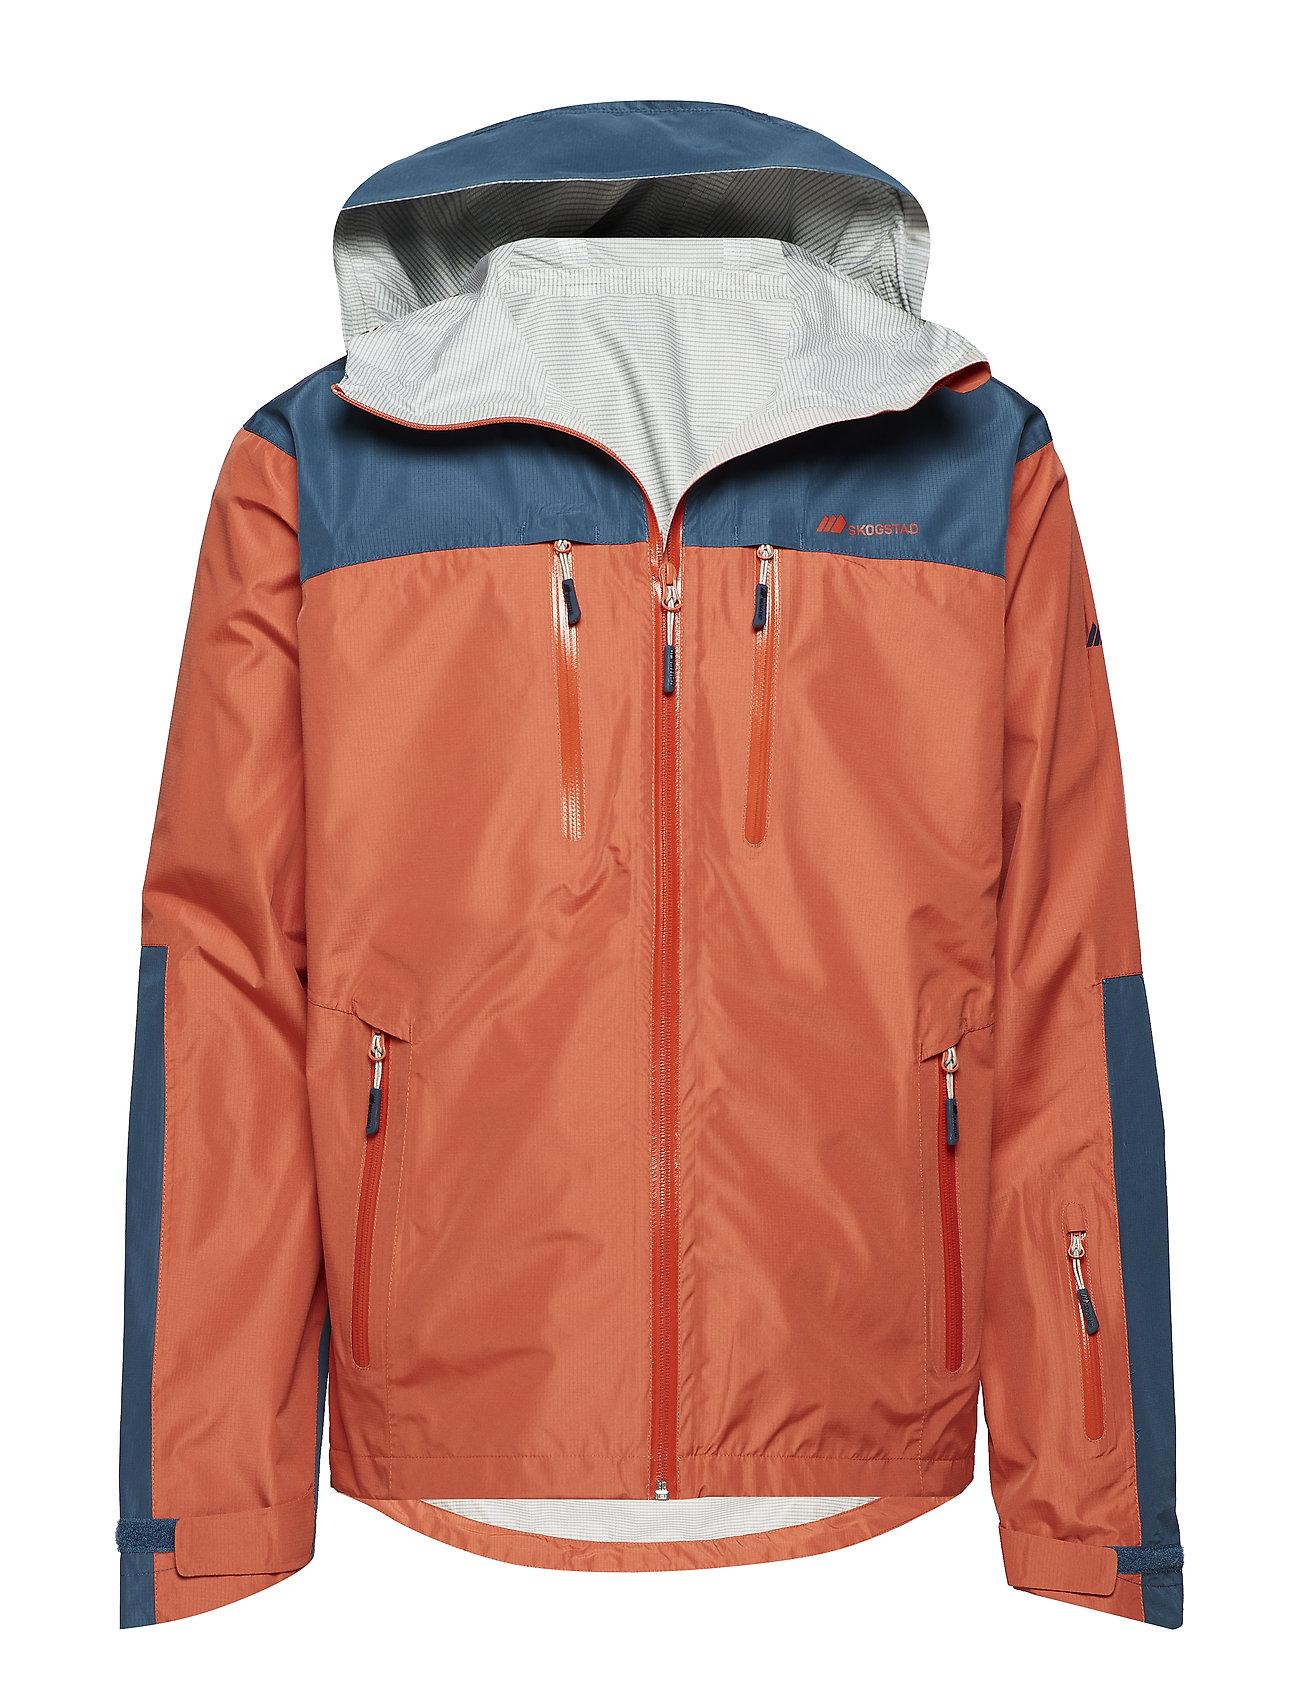 776412fc Kirkestinden 2,5-layer Technical Shell Jacket (Chilli) (106.59 ...